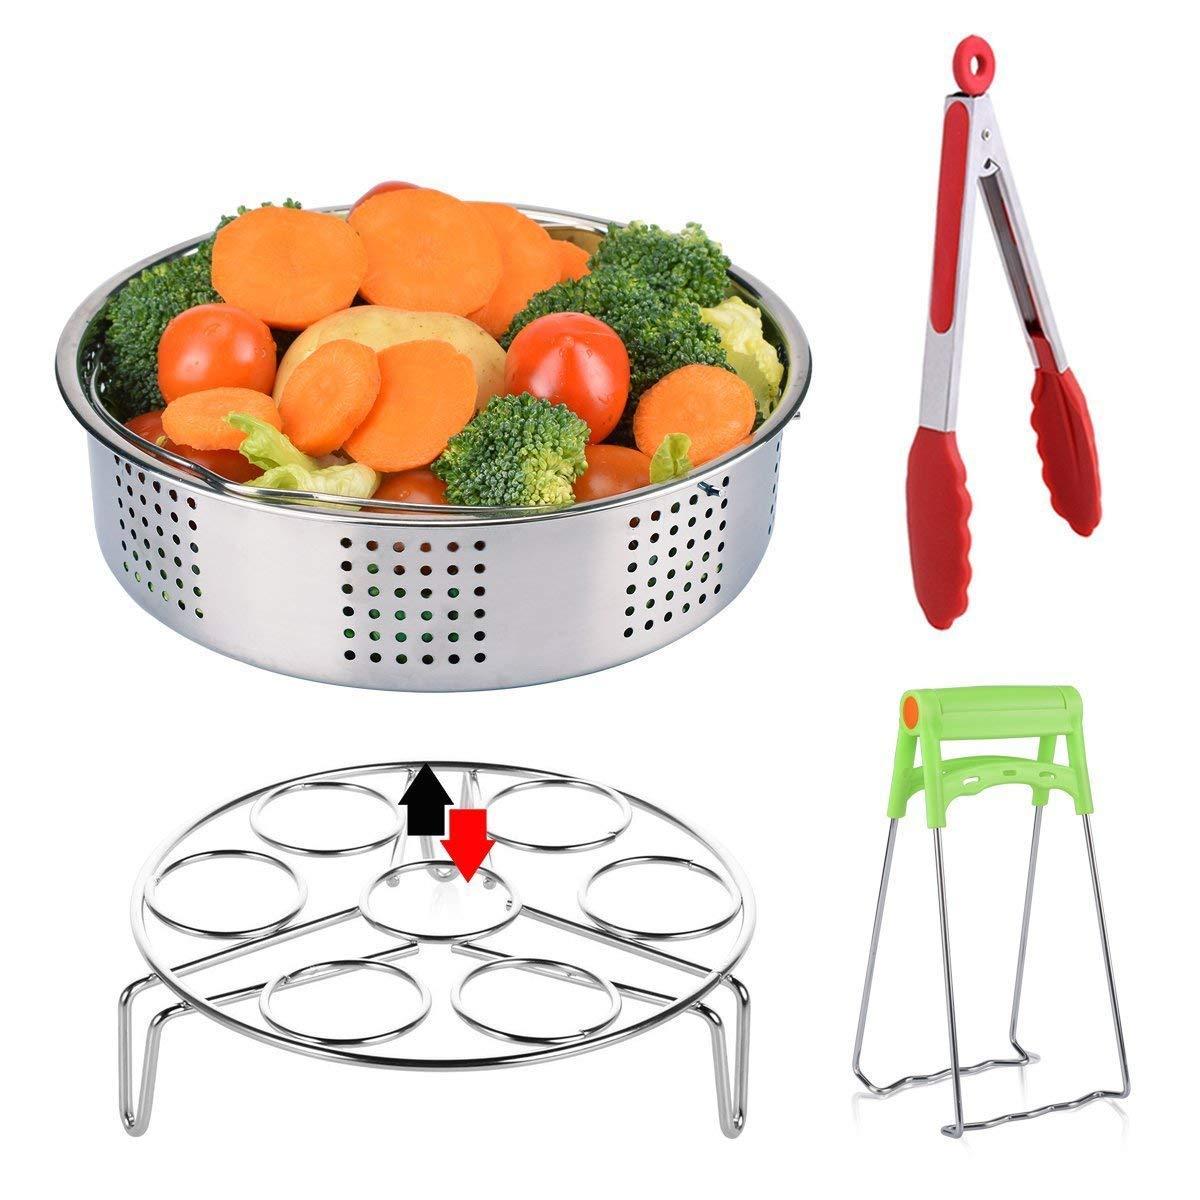 Instant Pot Accessories, Steamer Basket Set with Egg Steamer Rack Stand/Kitchen Tongs/Bowl Clip/Vegetable Steamer Insert for Pressure Cooker Accessories, Fits Instant Pot 5,6,8 qt Pressure Cooker Pack of 4